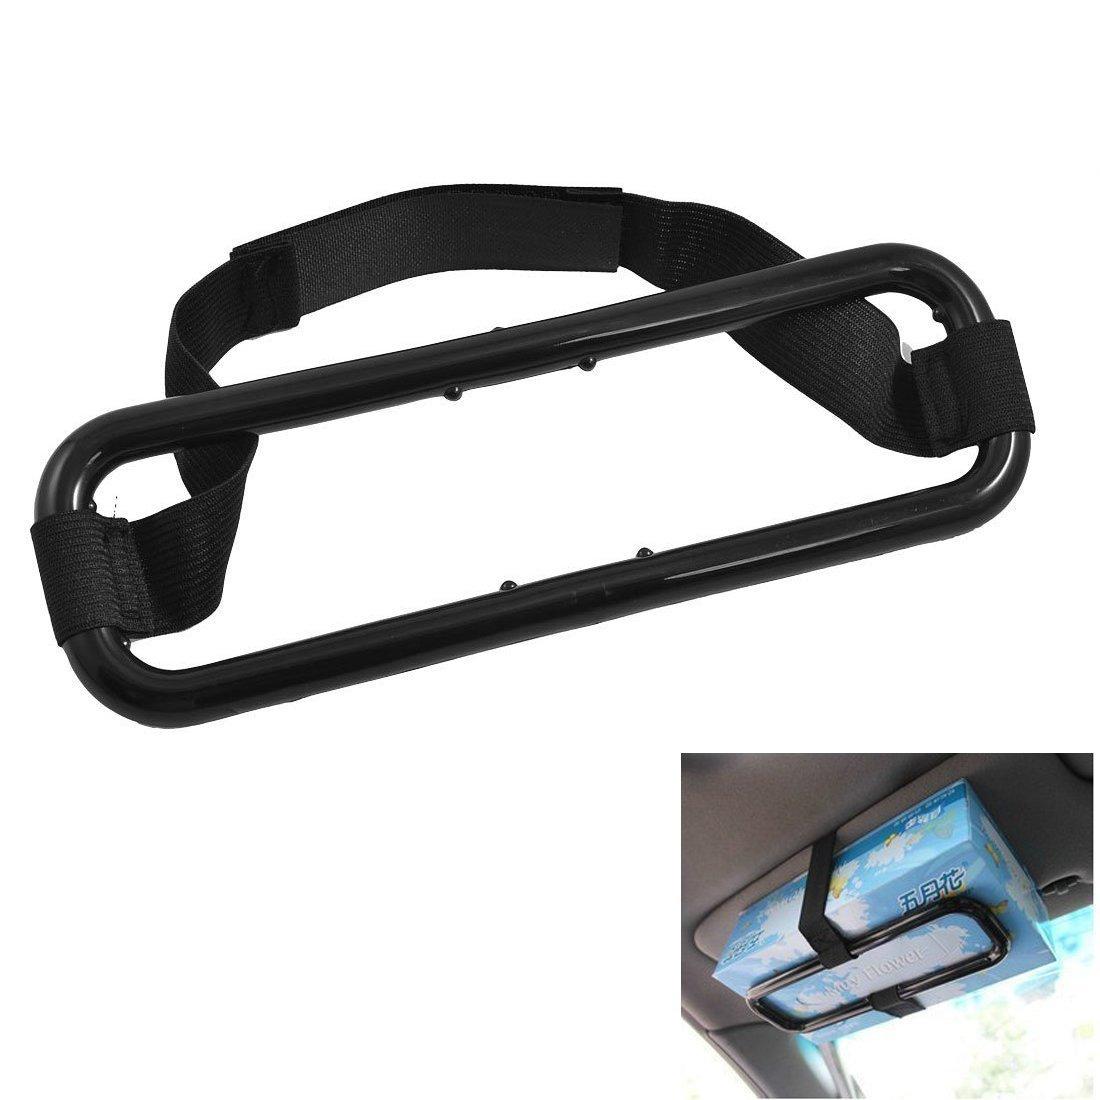 SODIAL(R) Car Sun Visor Tissue Paper Box Holder Auto Seat Back Hold Clip AEQW-WER-AW143252